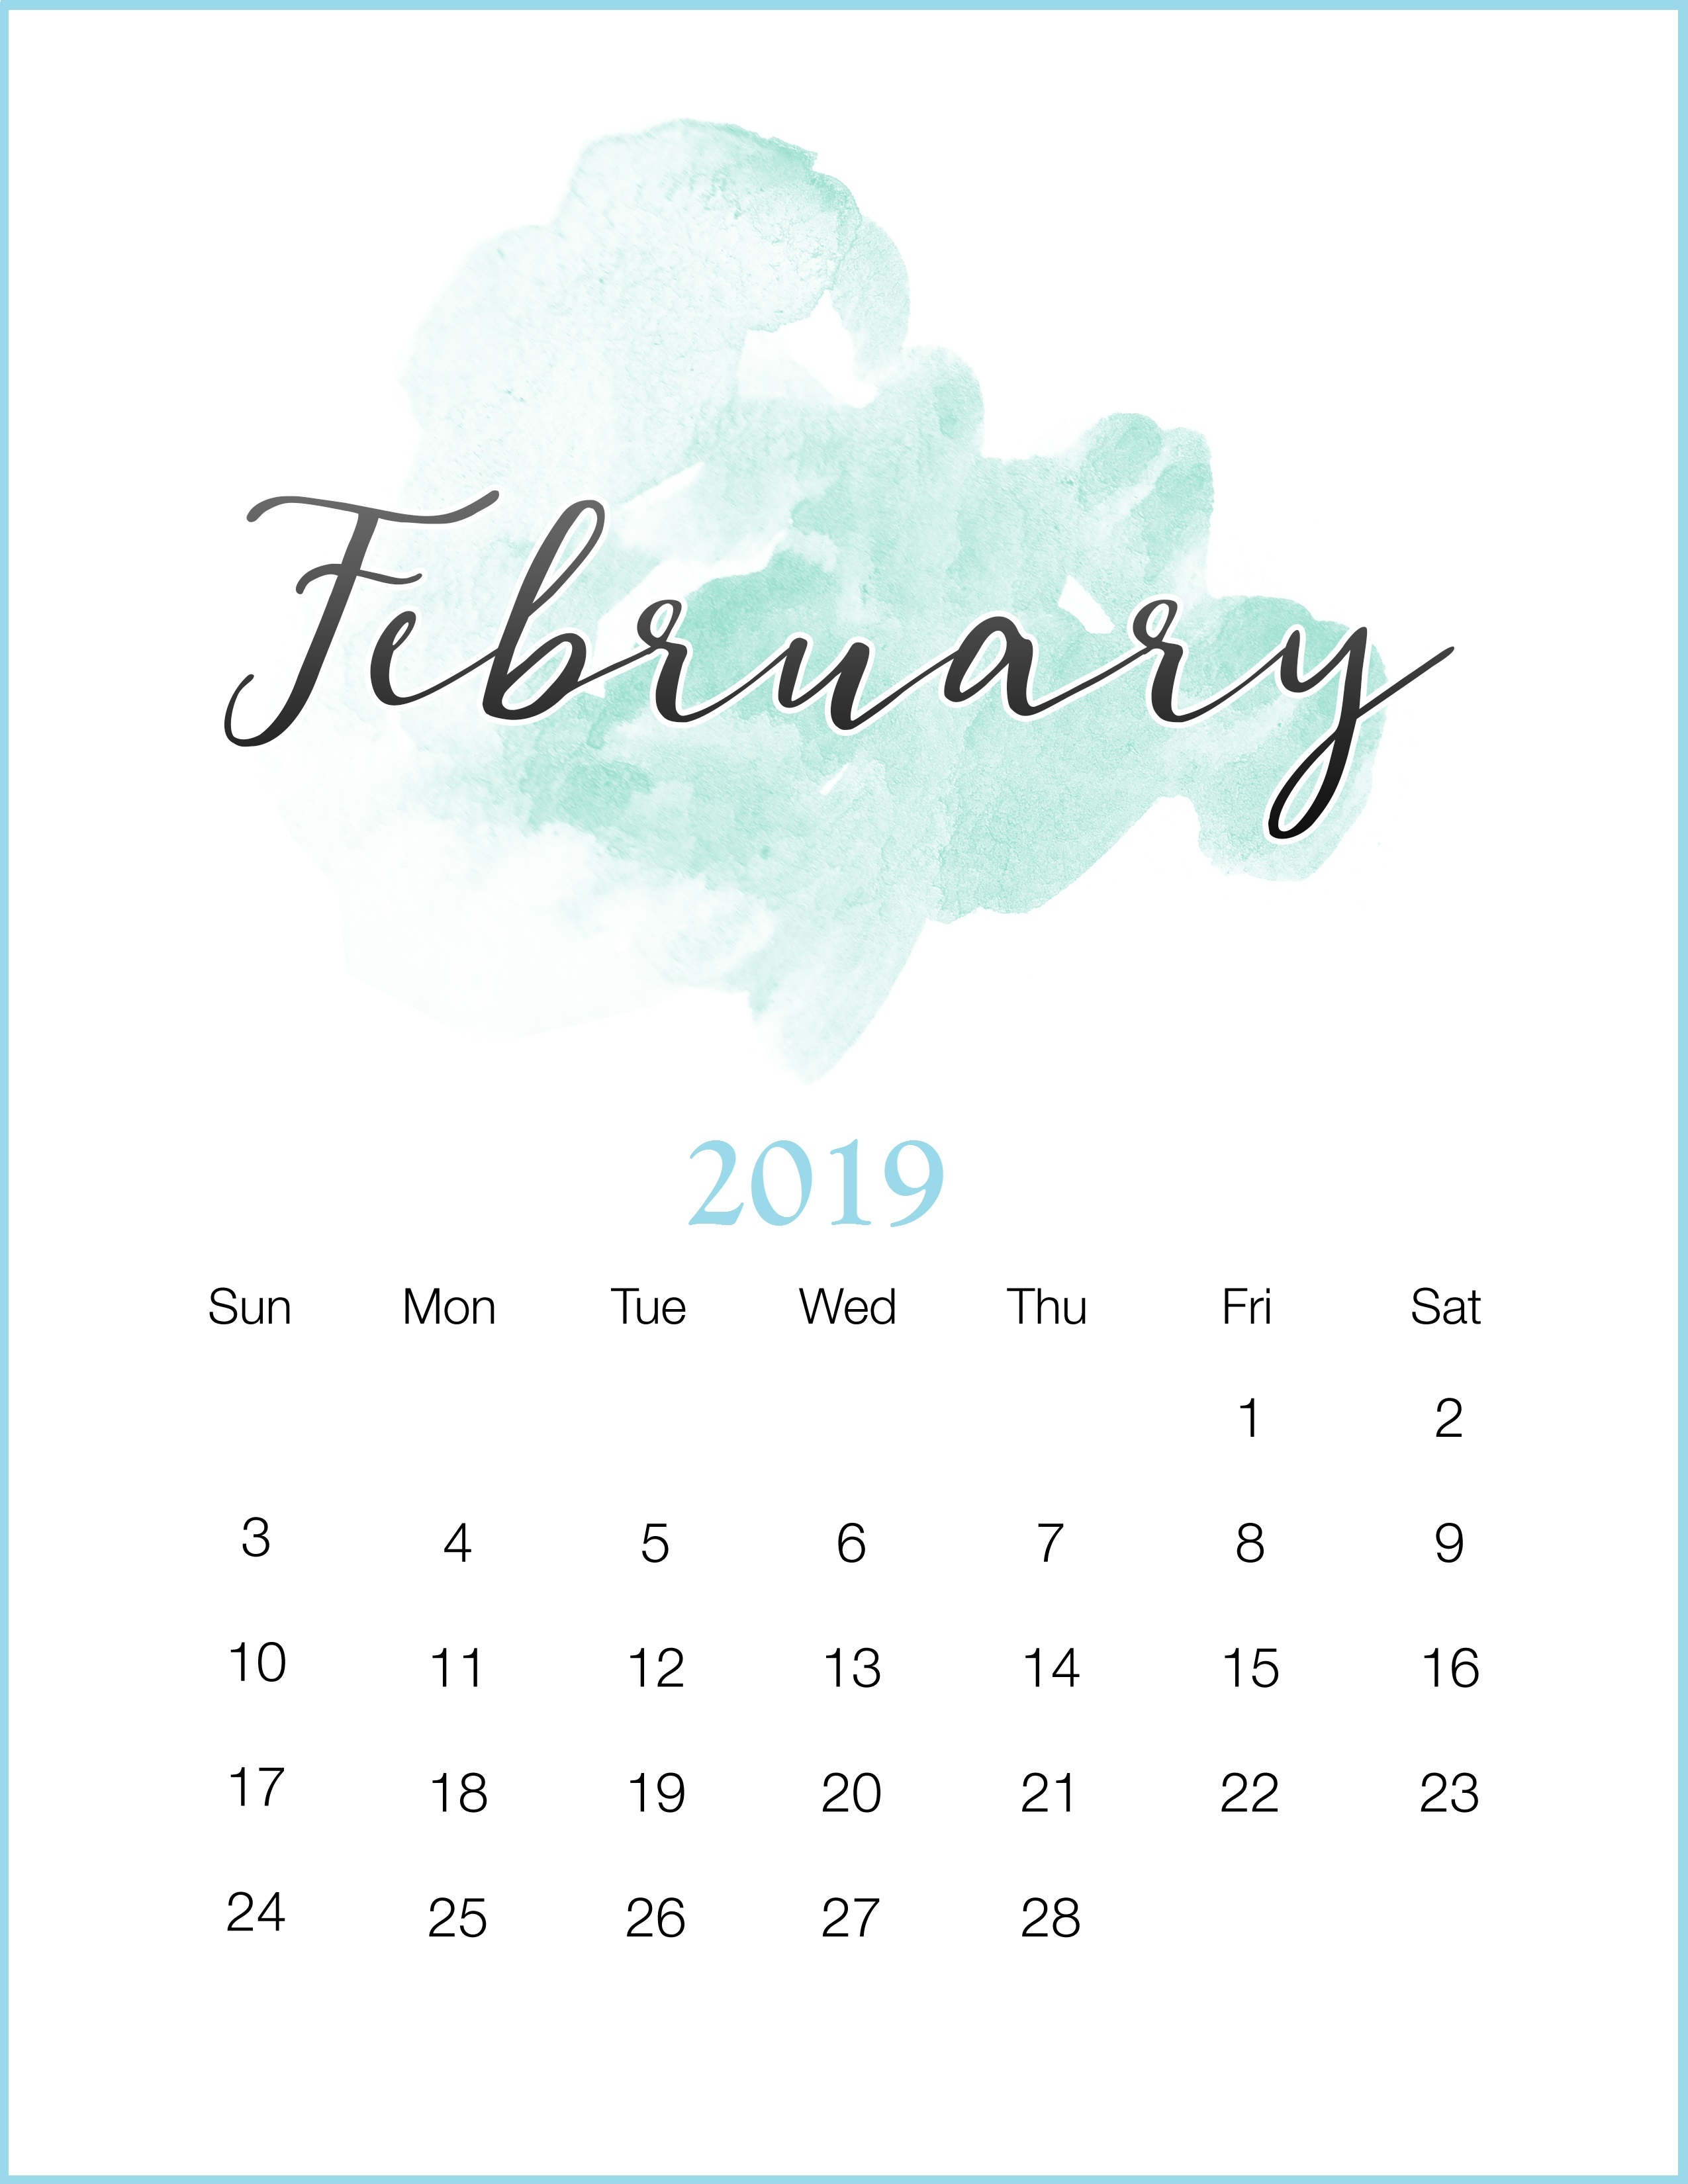 free template february 2019 editable calendar march 2019 calendar::February 2019 Calendar Editable